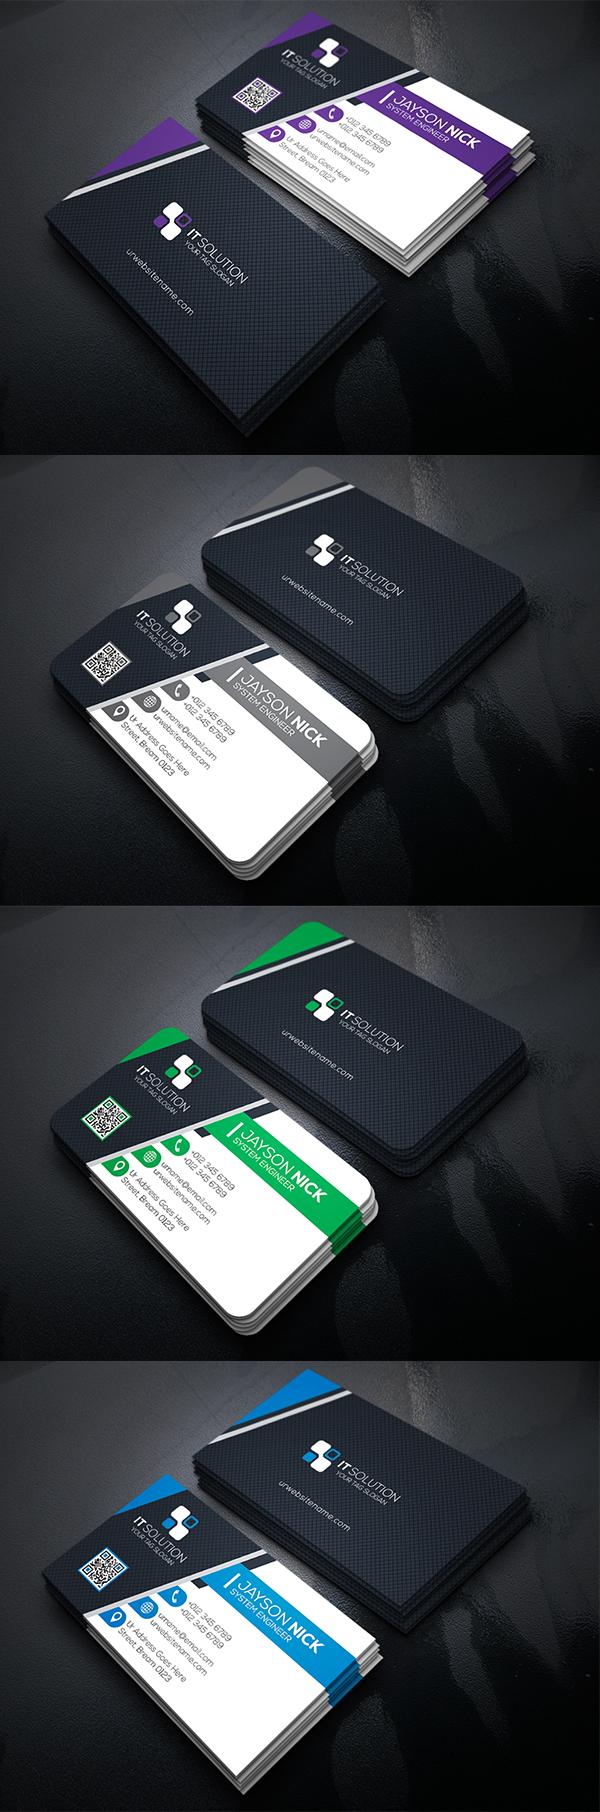 11 Business Card Design